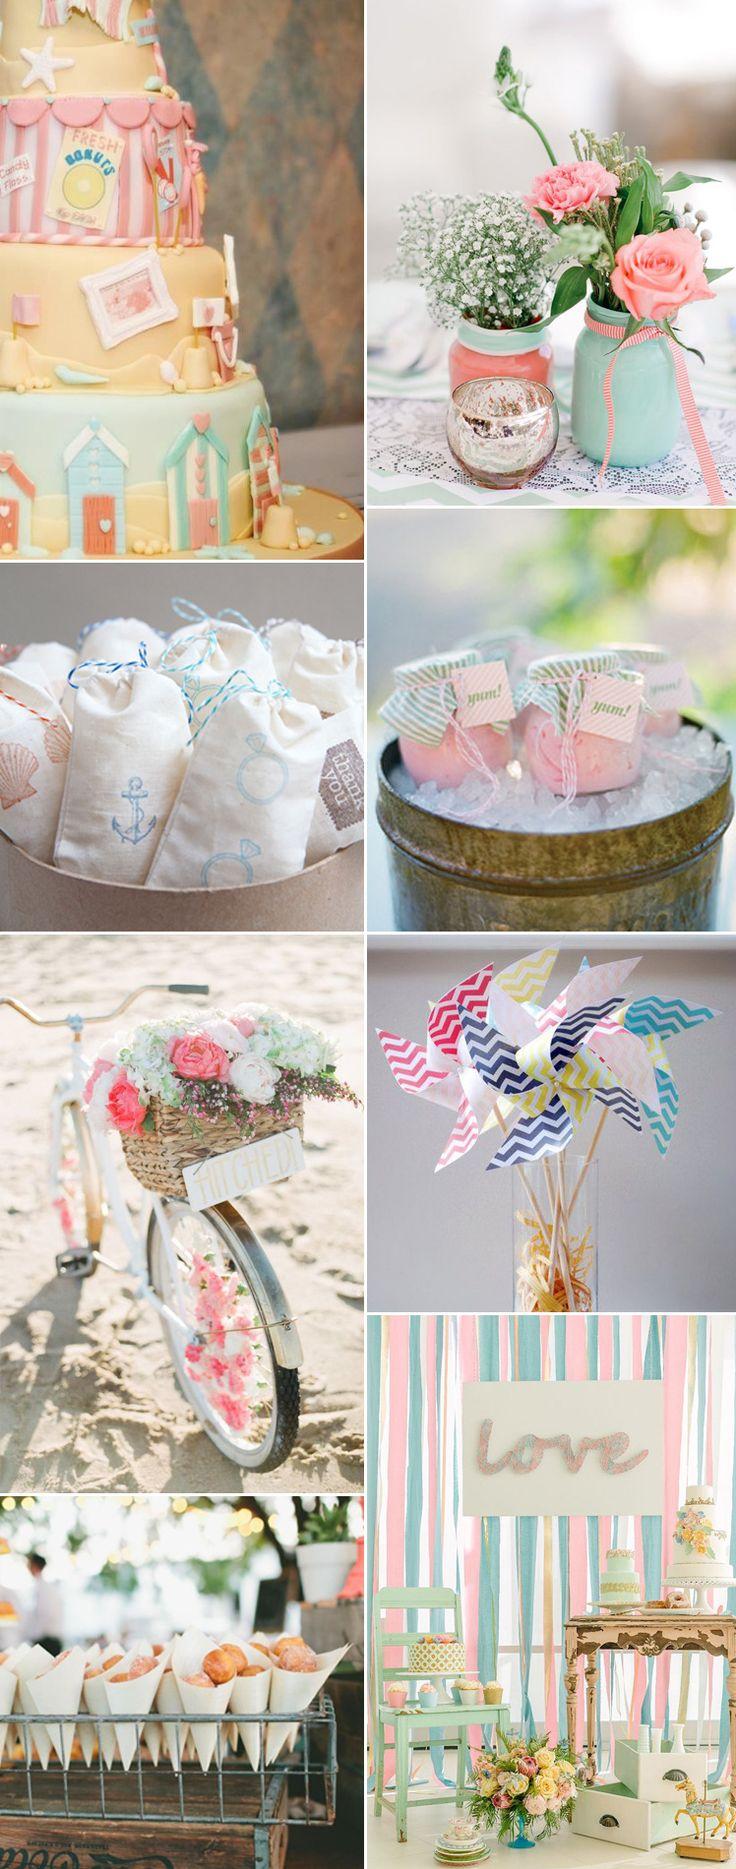 A quintessential seaside wedding - for more British seaside wedding ideas take a look at GS Inspiration | Glitzy Secrets